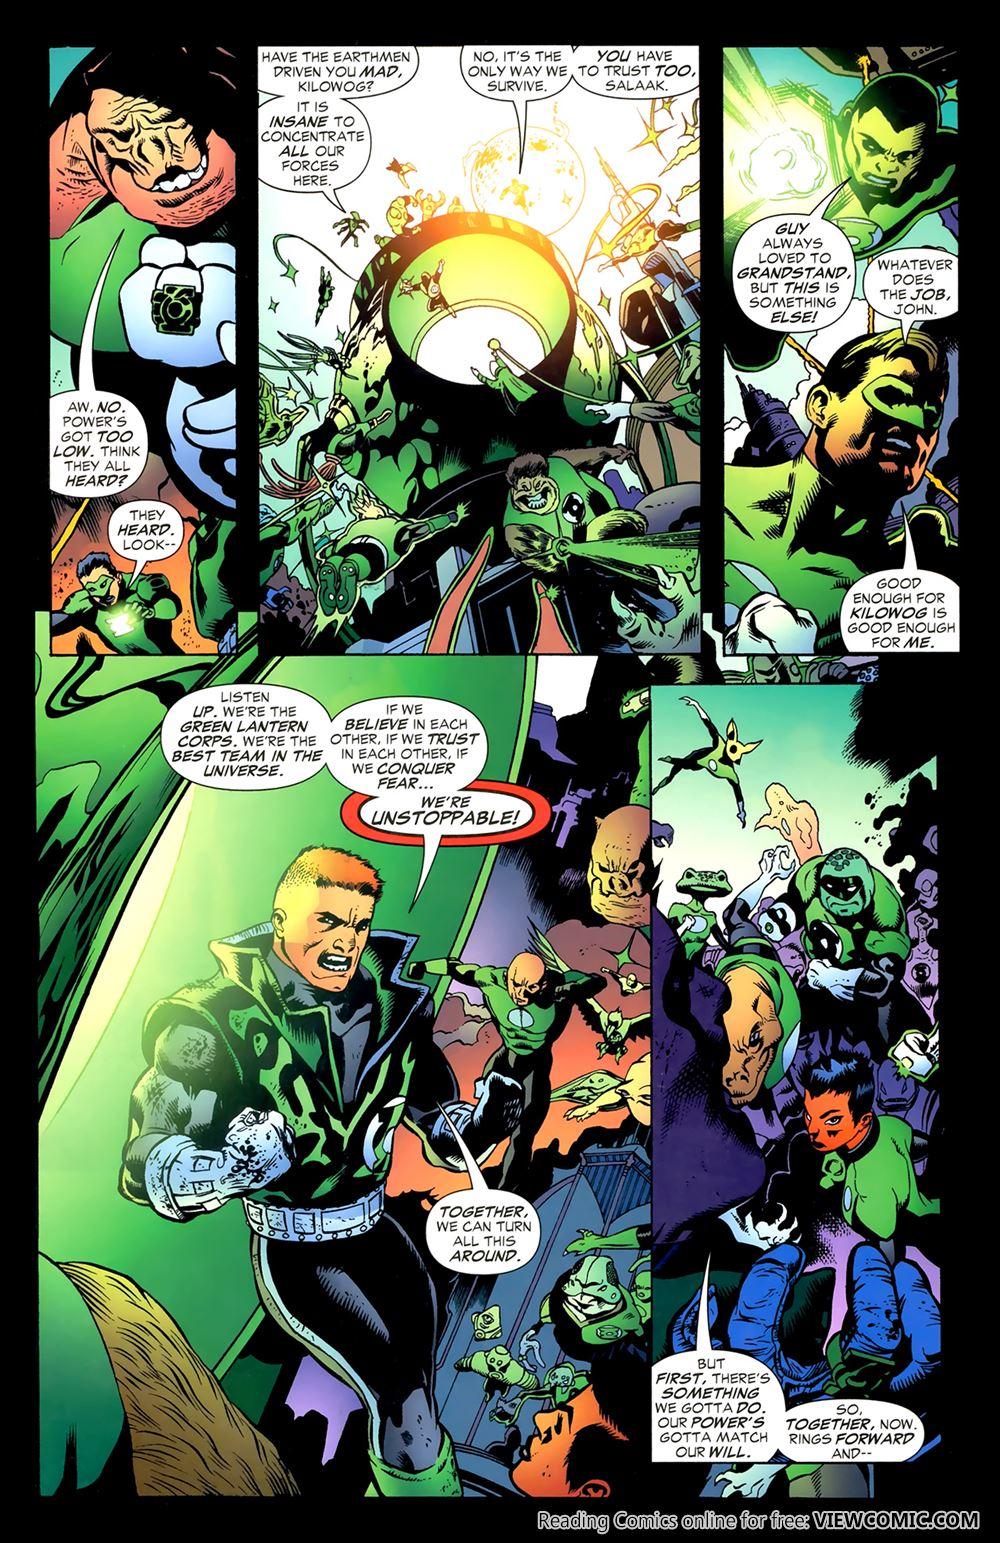 green lantern corps recharge 05 of 5 2006 reading comics